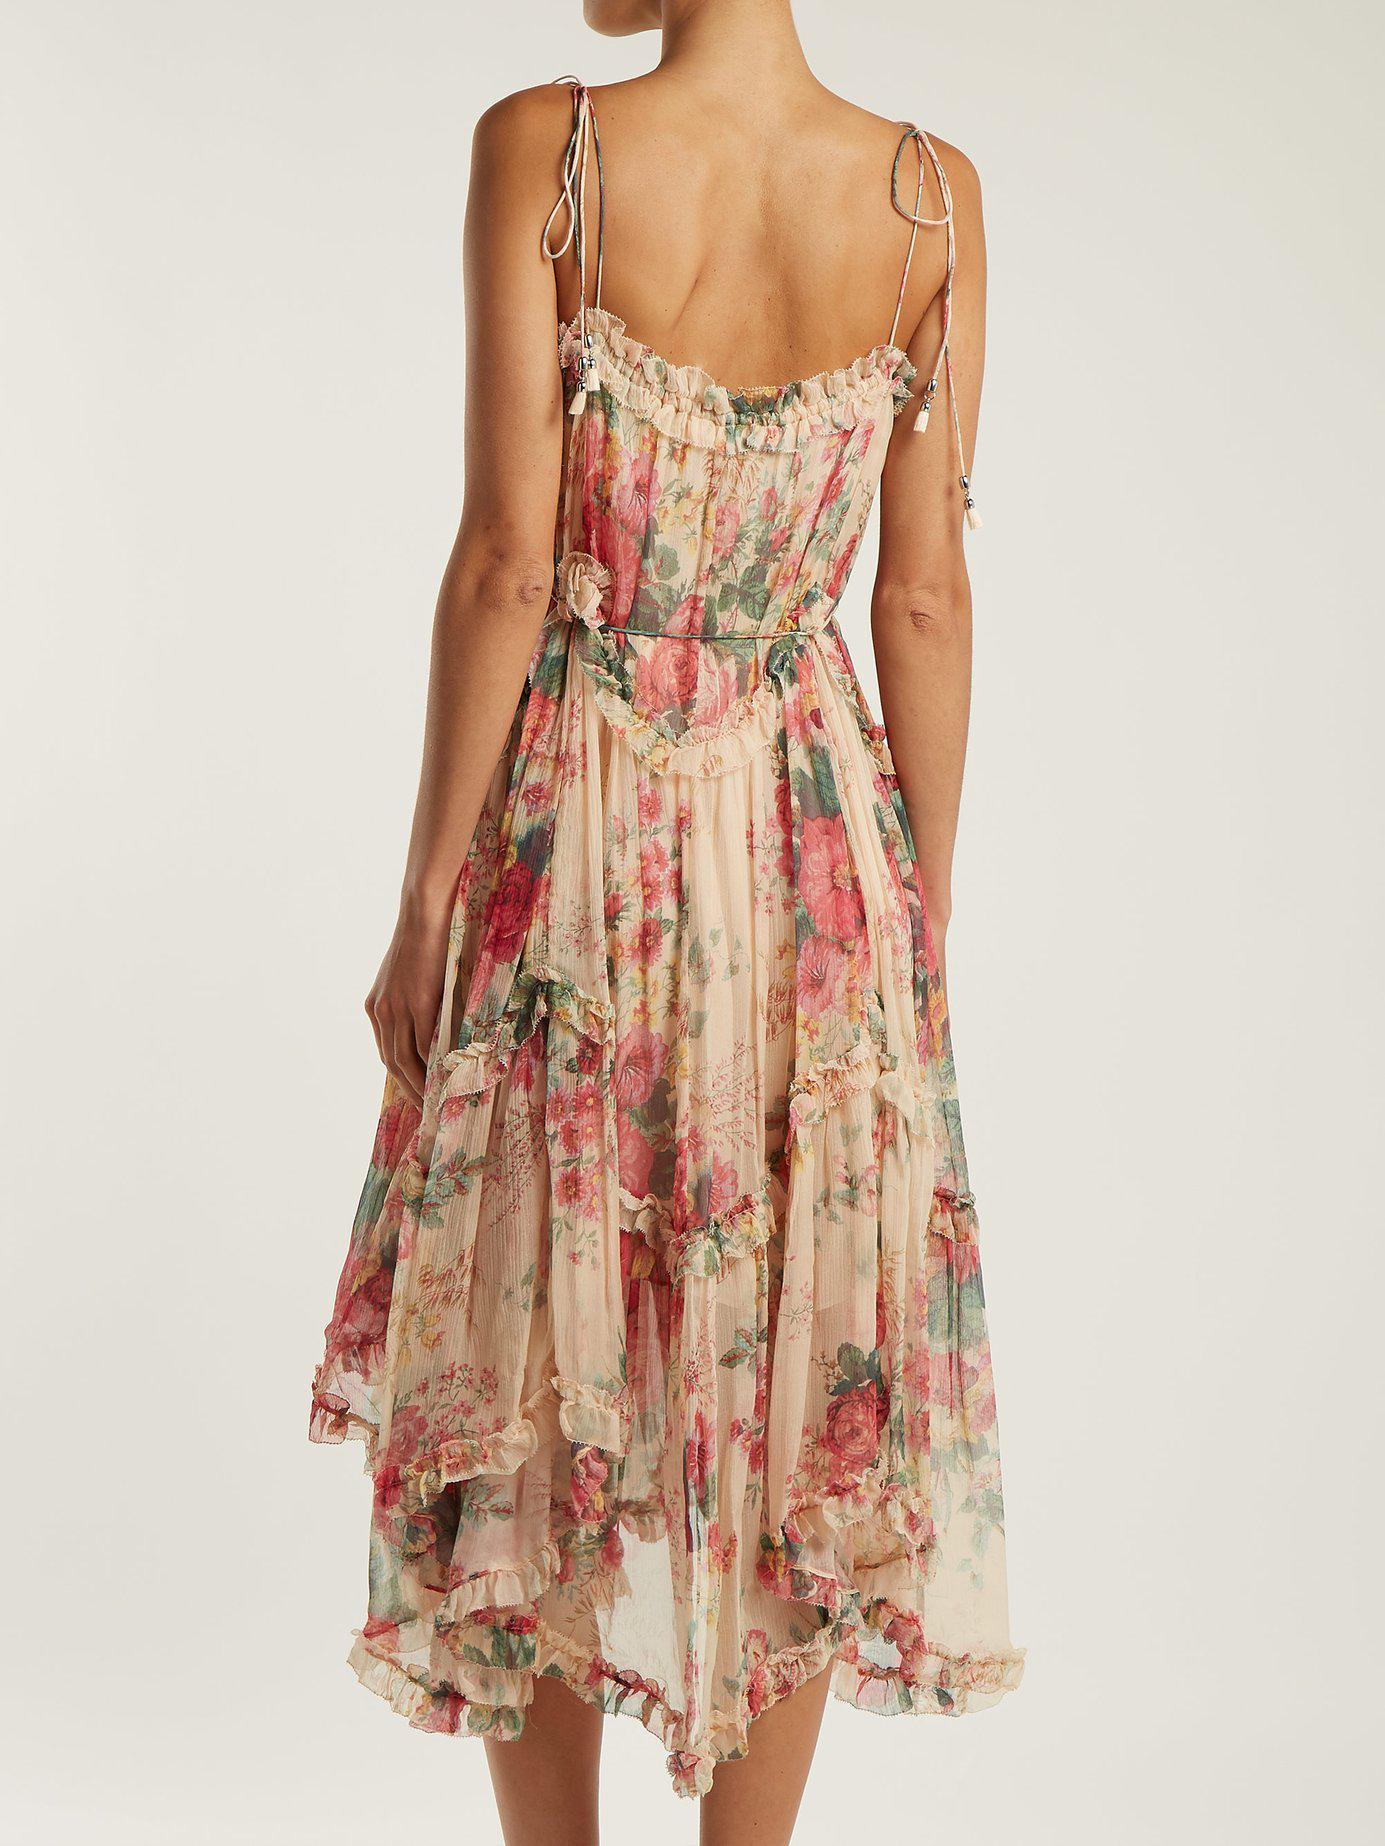 8e17fd4b010978 Zimmermann - Multicolor Laelia Floral Print Silk Dress - Lyst. View  fullscreen